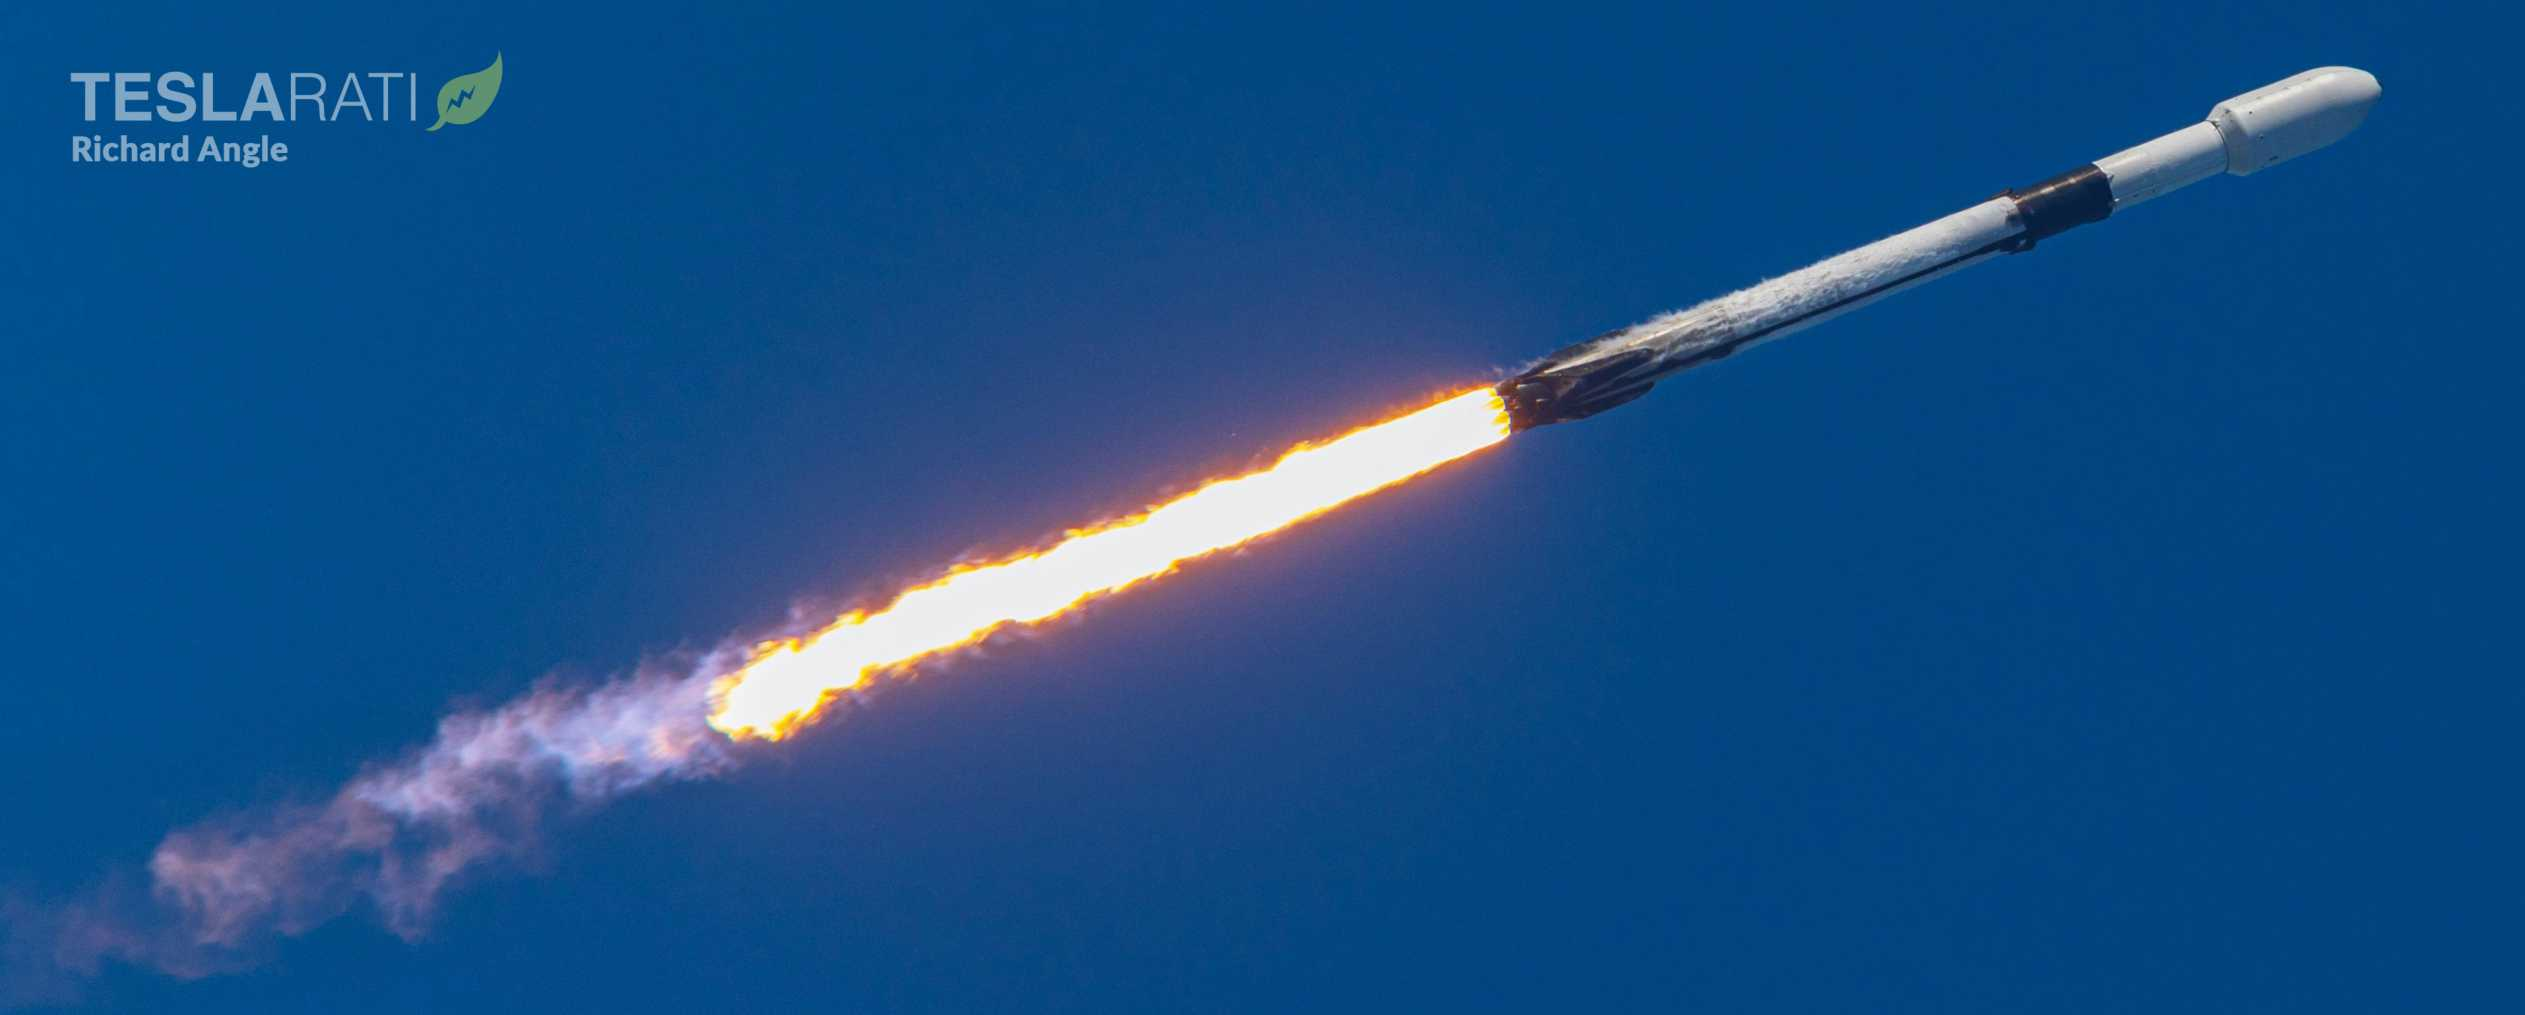 ANASIS II Falcon 9 B1058 072020 (Richard Angle) launch 2 crop (c)